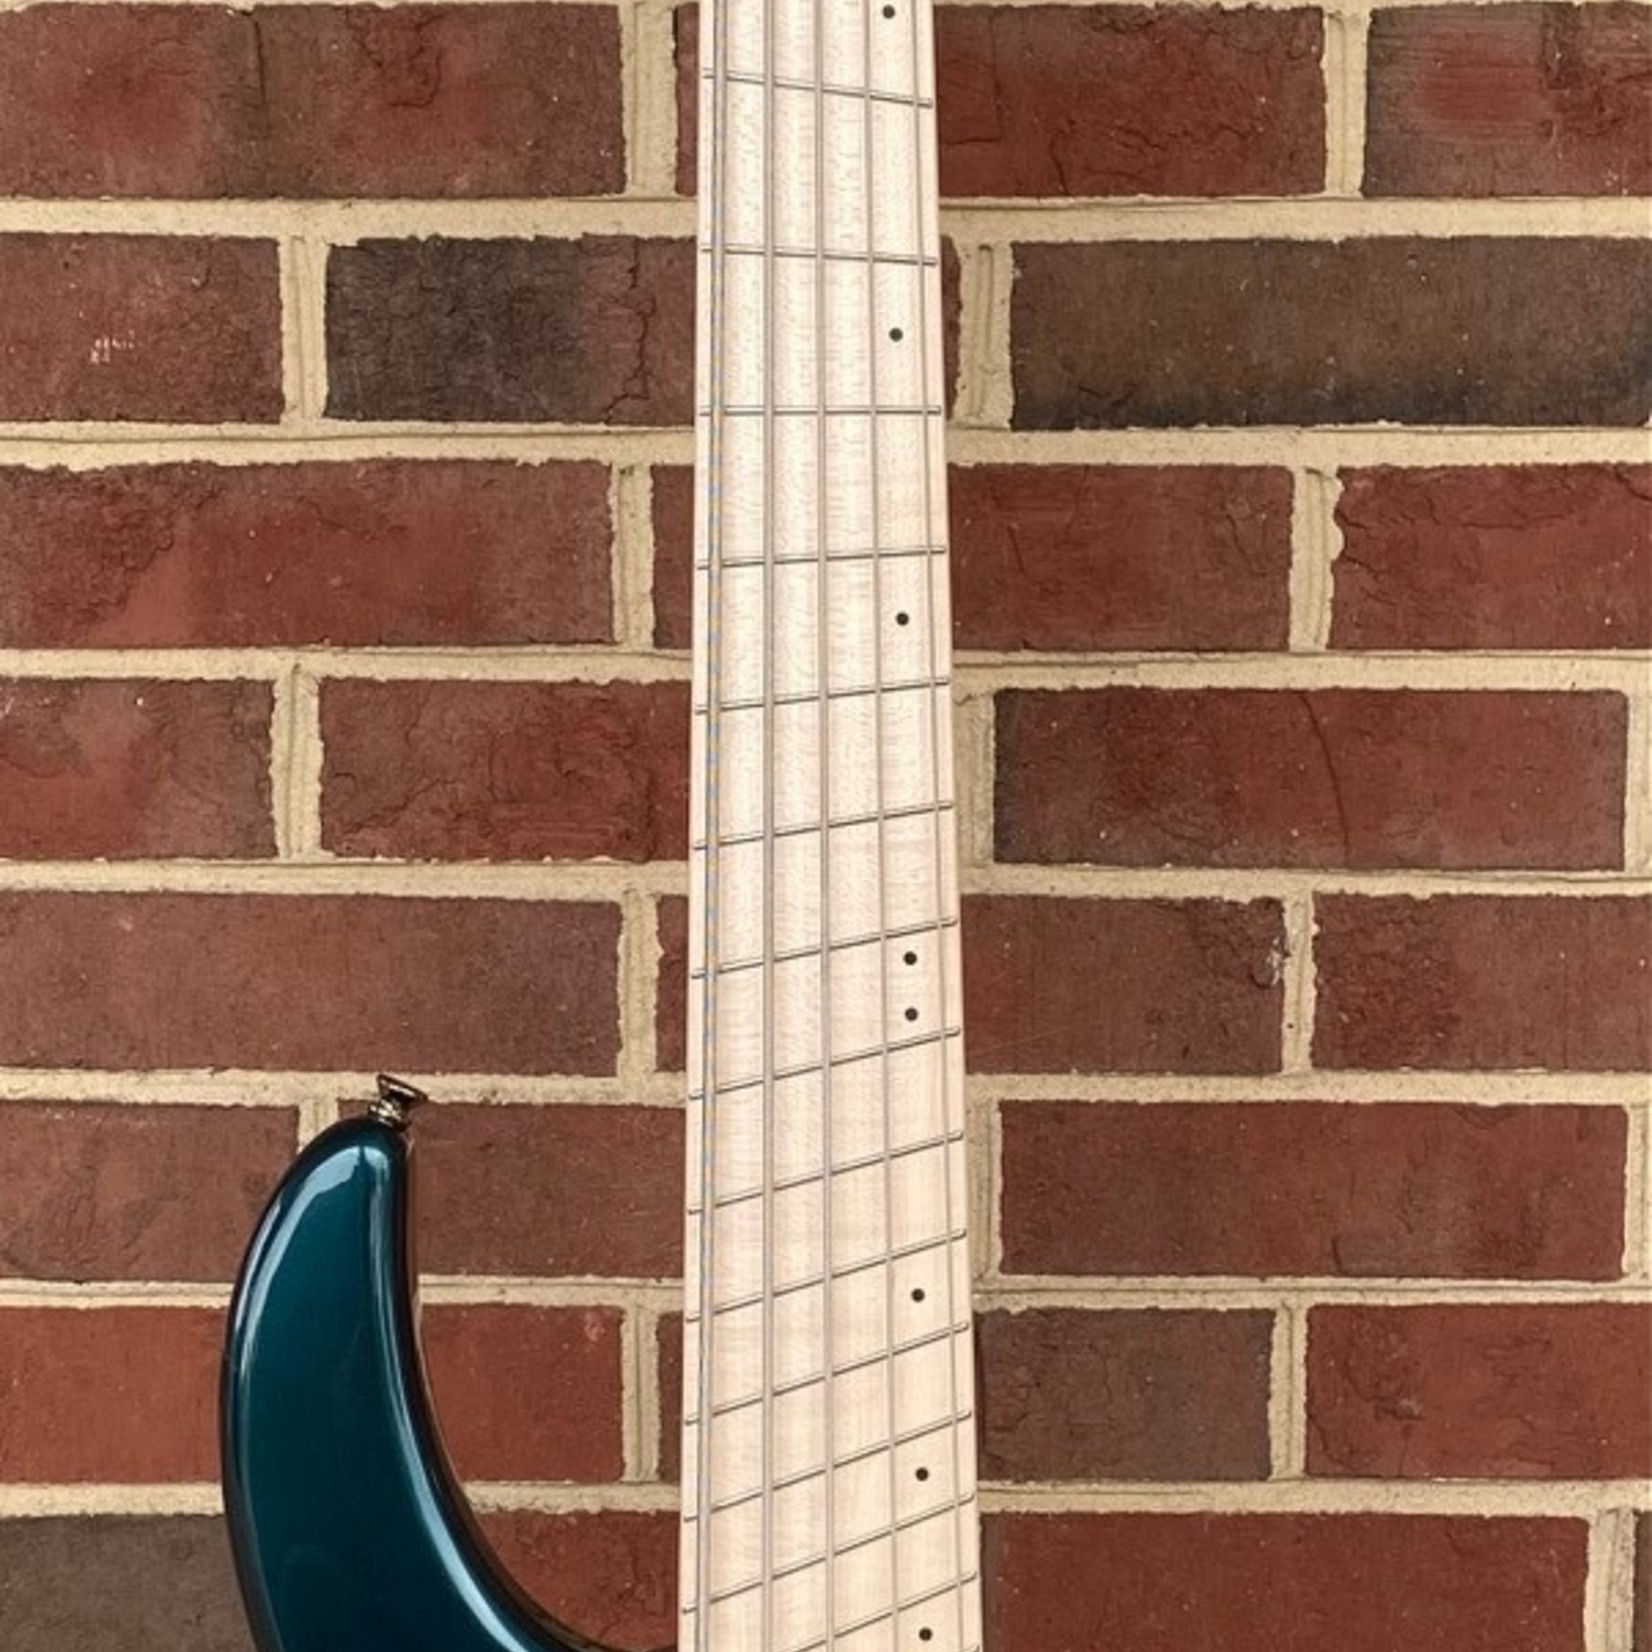 Dingwall Dingwall NG3 5-String, Gloss Black Forrest Green, Maple Fretboard, Matching Headstock, Dingwall Gig Bag, SN# 8977